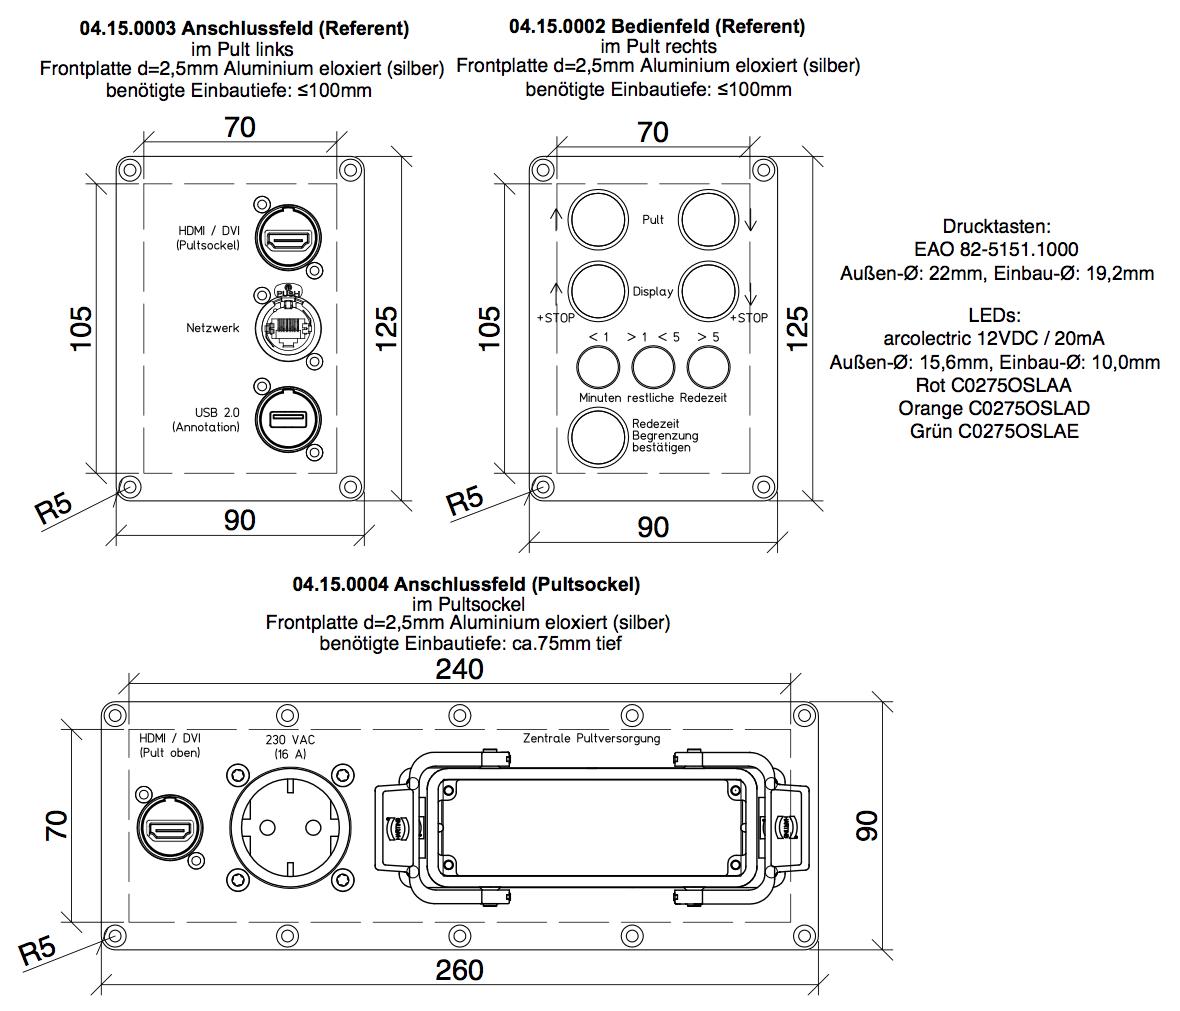 Versatzkasten Anschlussblende, Harting Multipin Steckverbinder, Medienblende, Bedienfeld Medientechnik